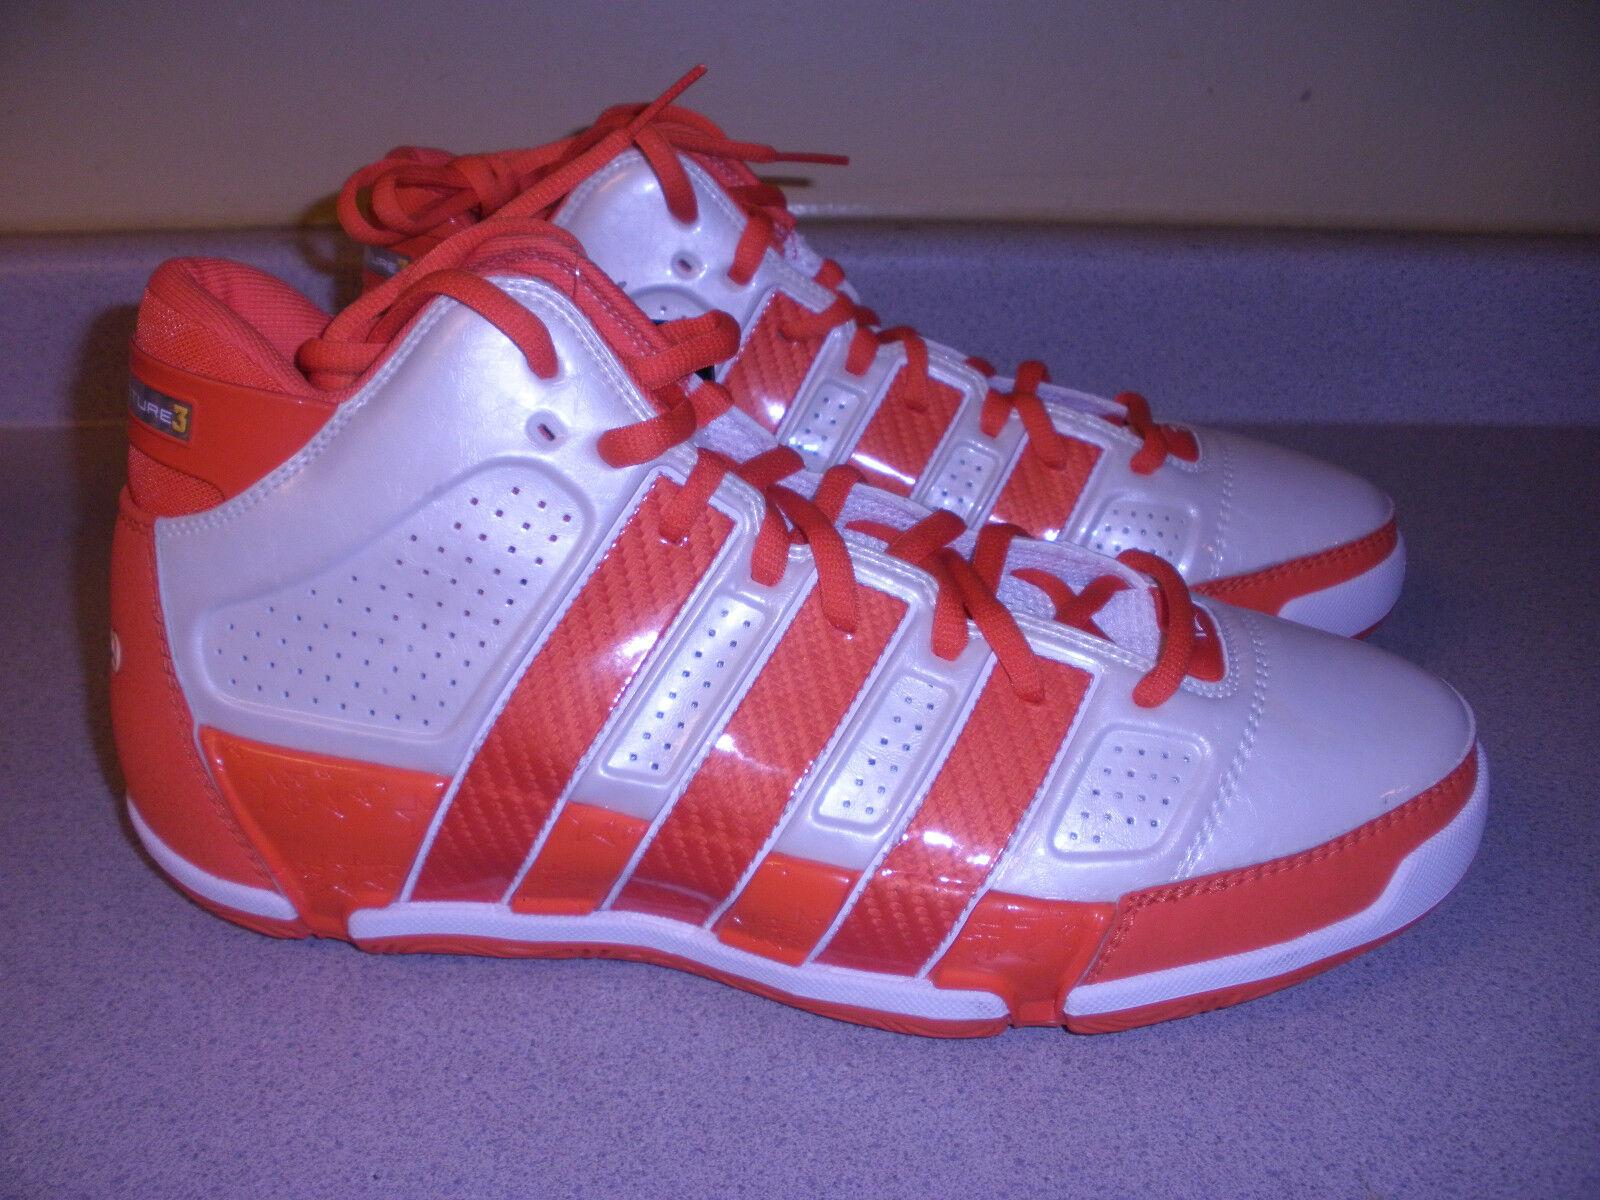 NWT Addidas CT 09 12.5 Men's Basketball Shoes US 12.5 09 ORANGE WHITE 6fe802